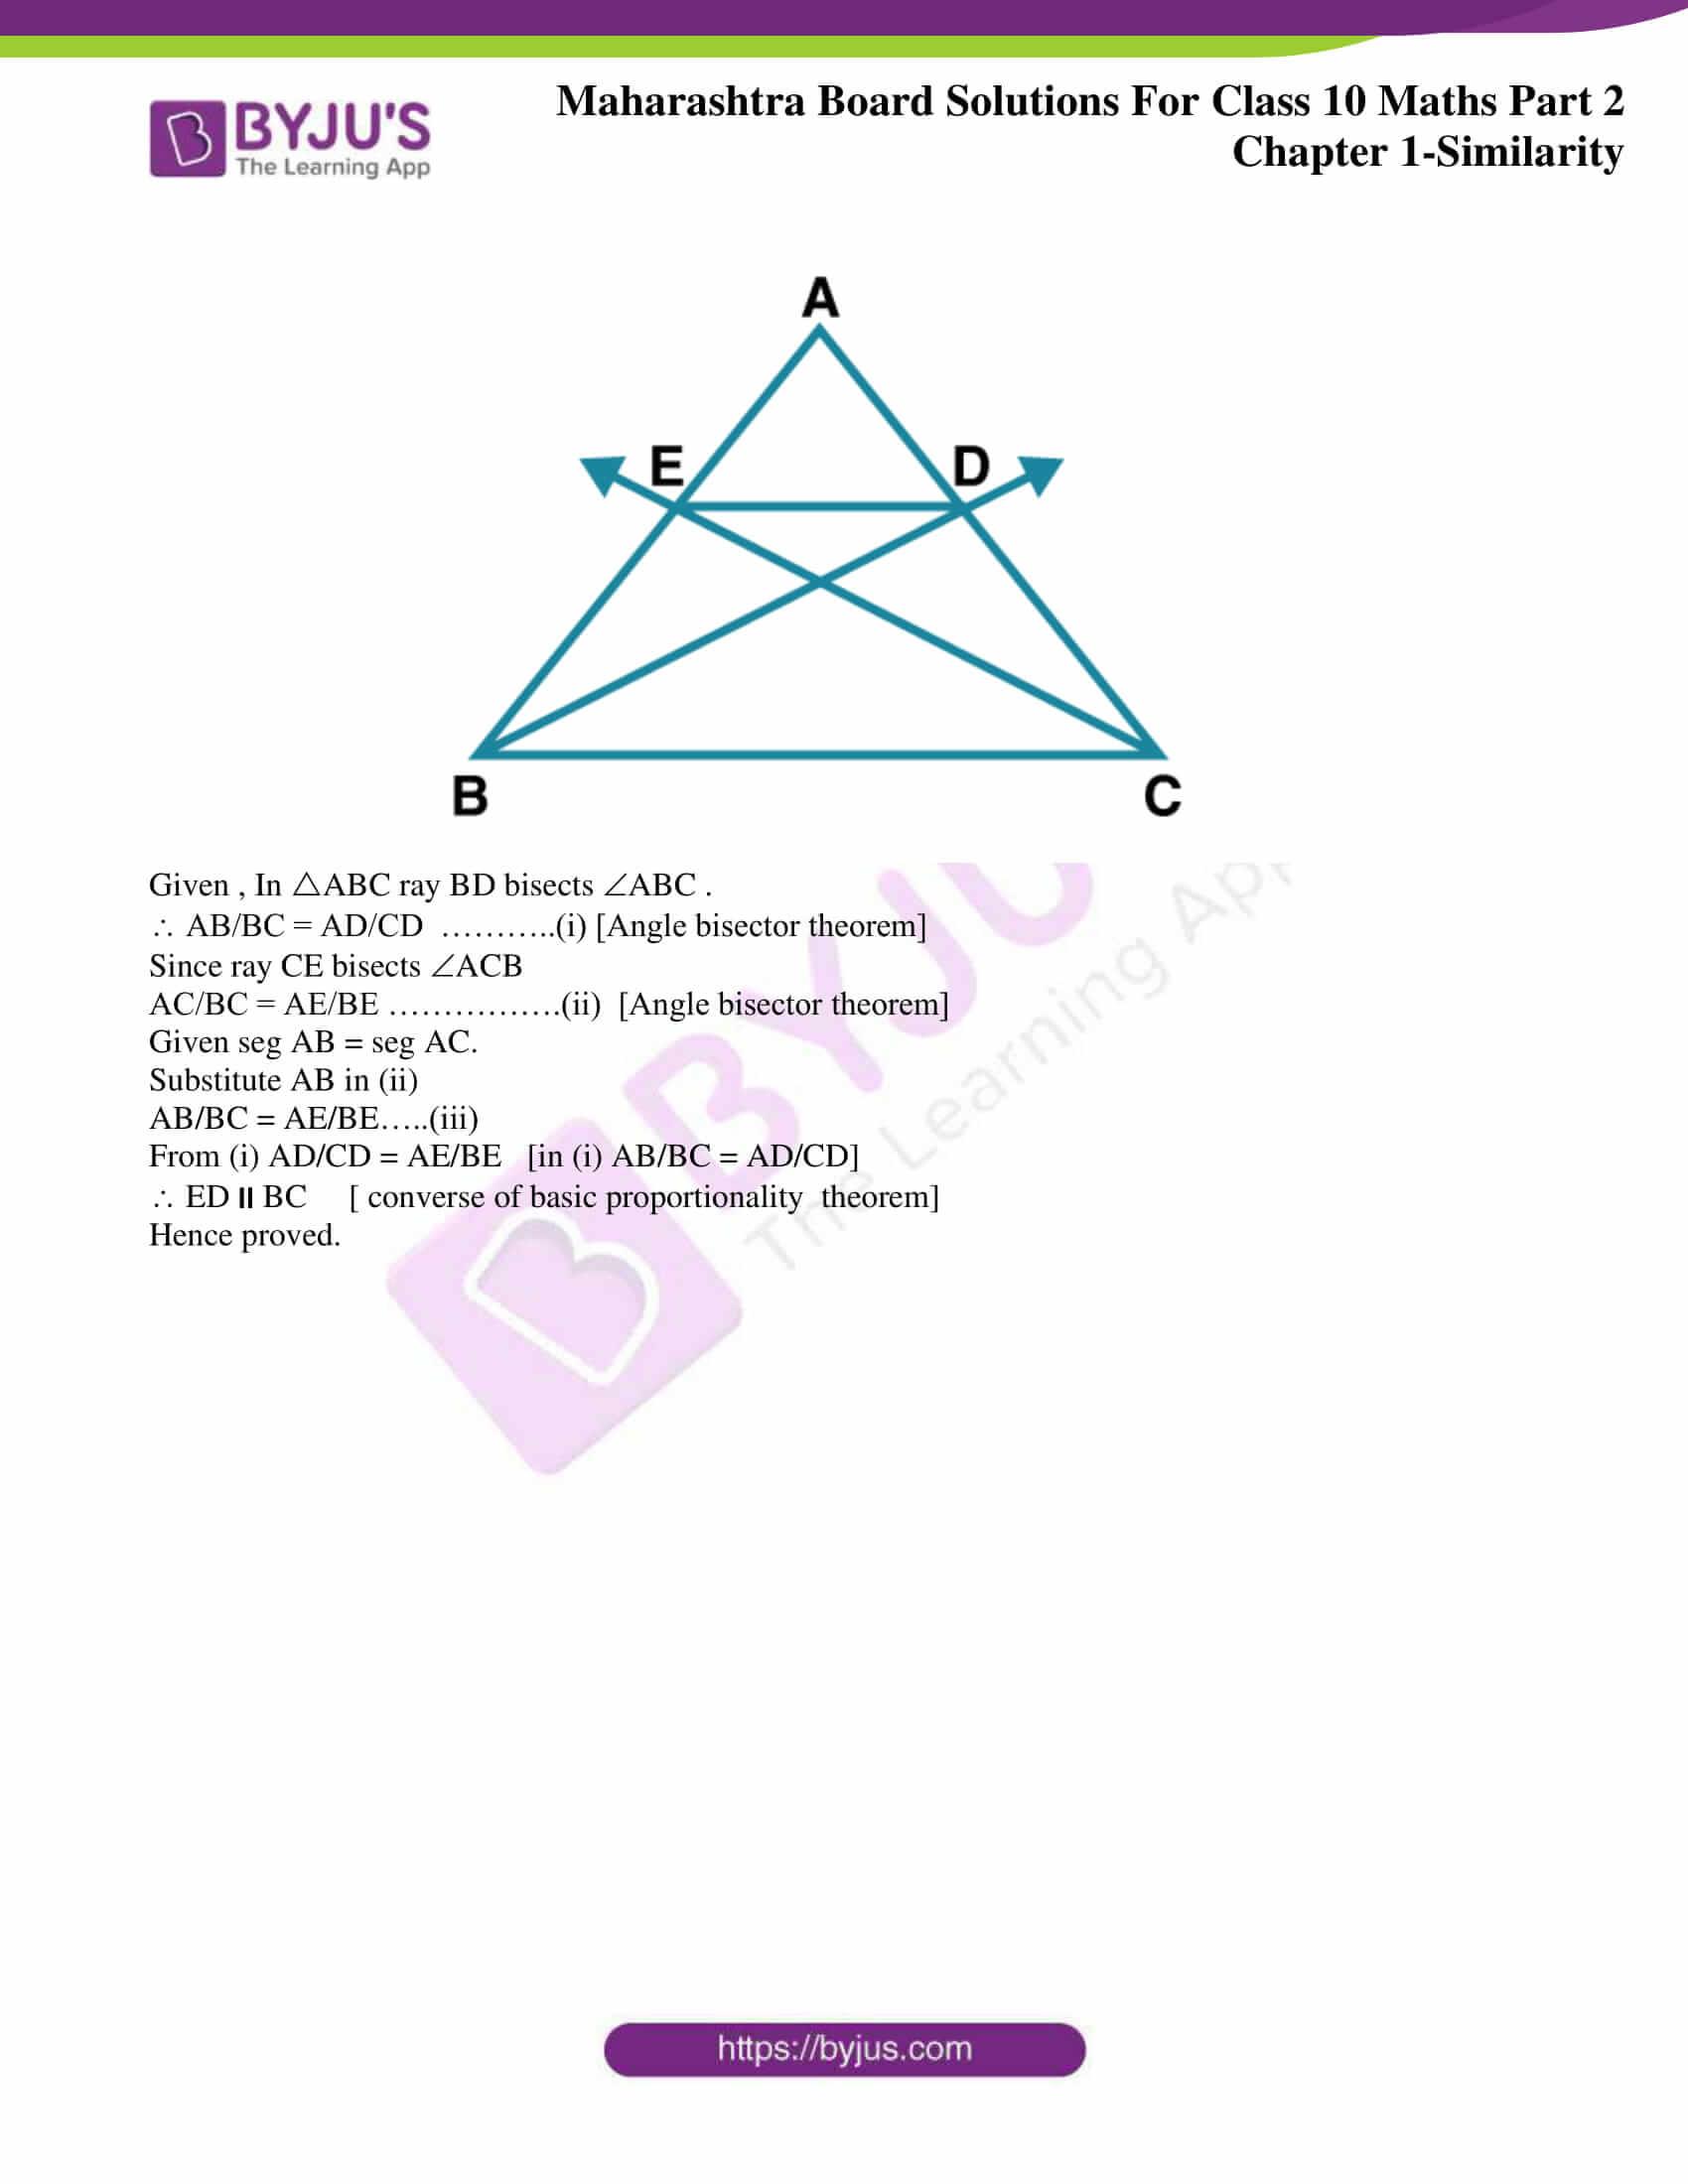 msbshse sol class 10 maths part 2 chapter 1 12